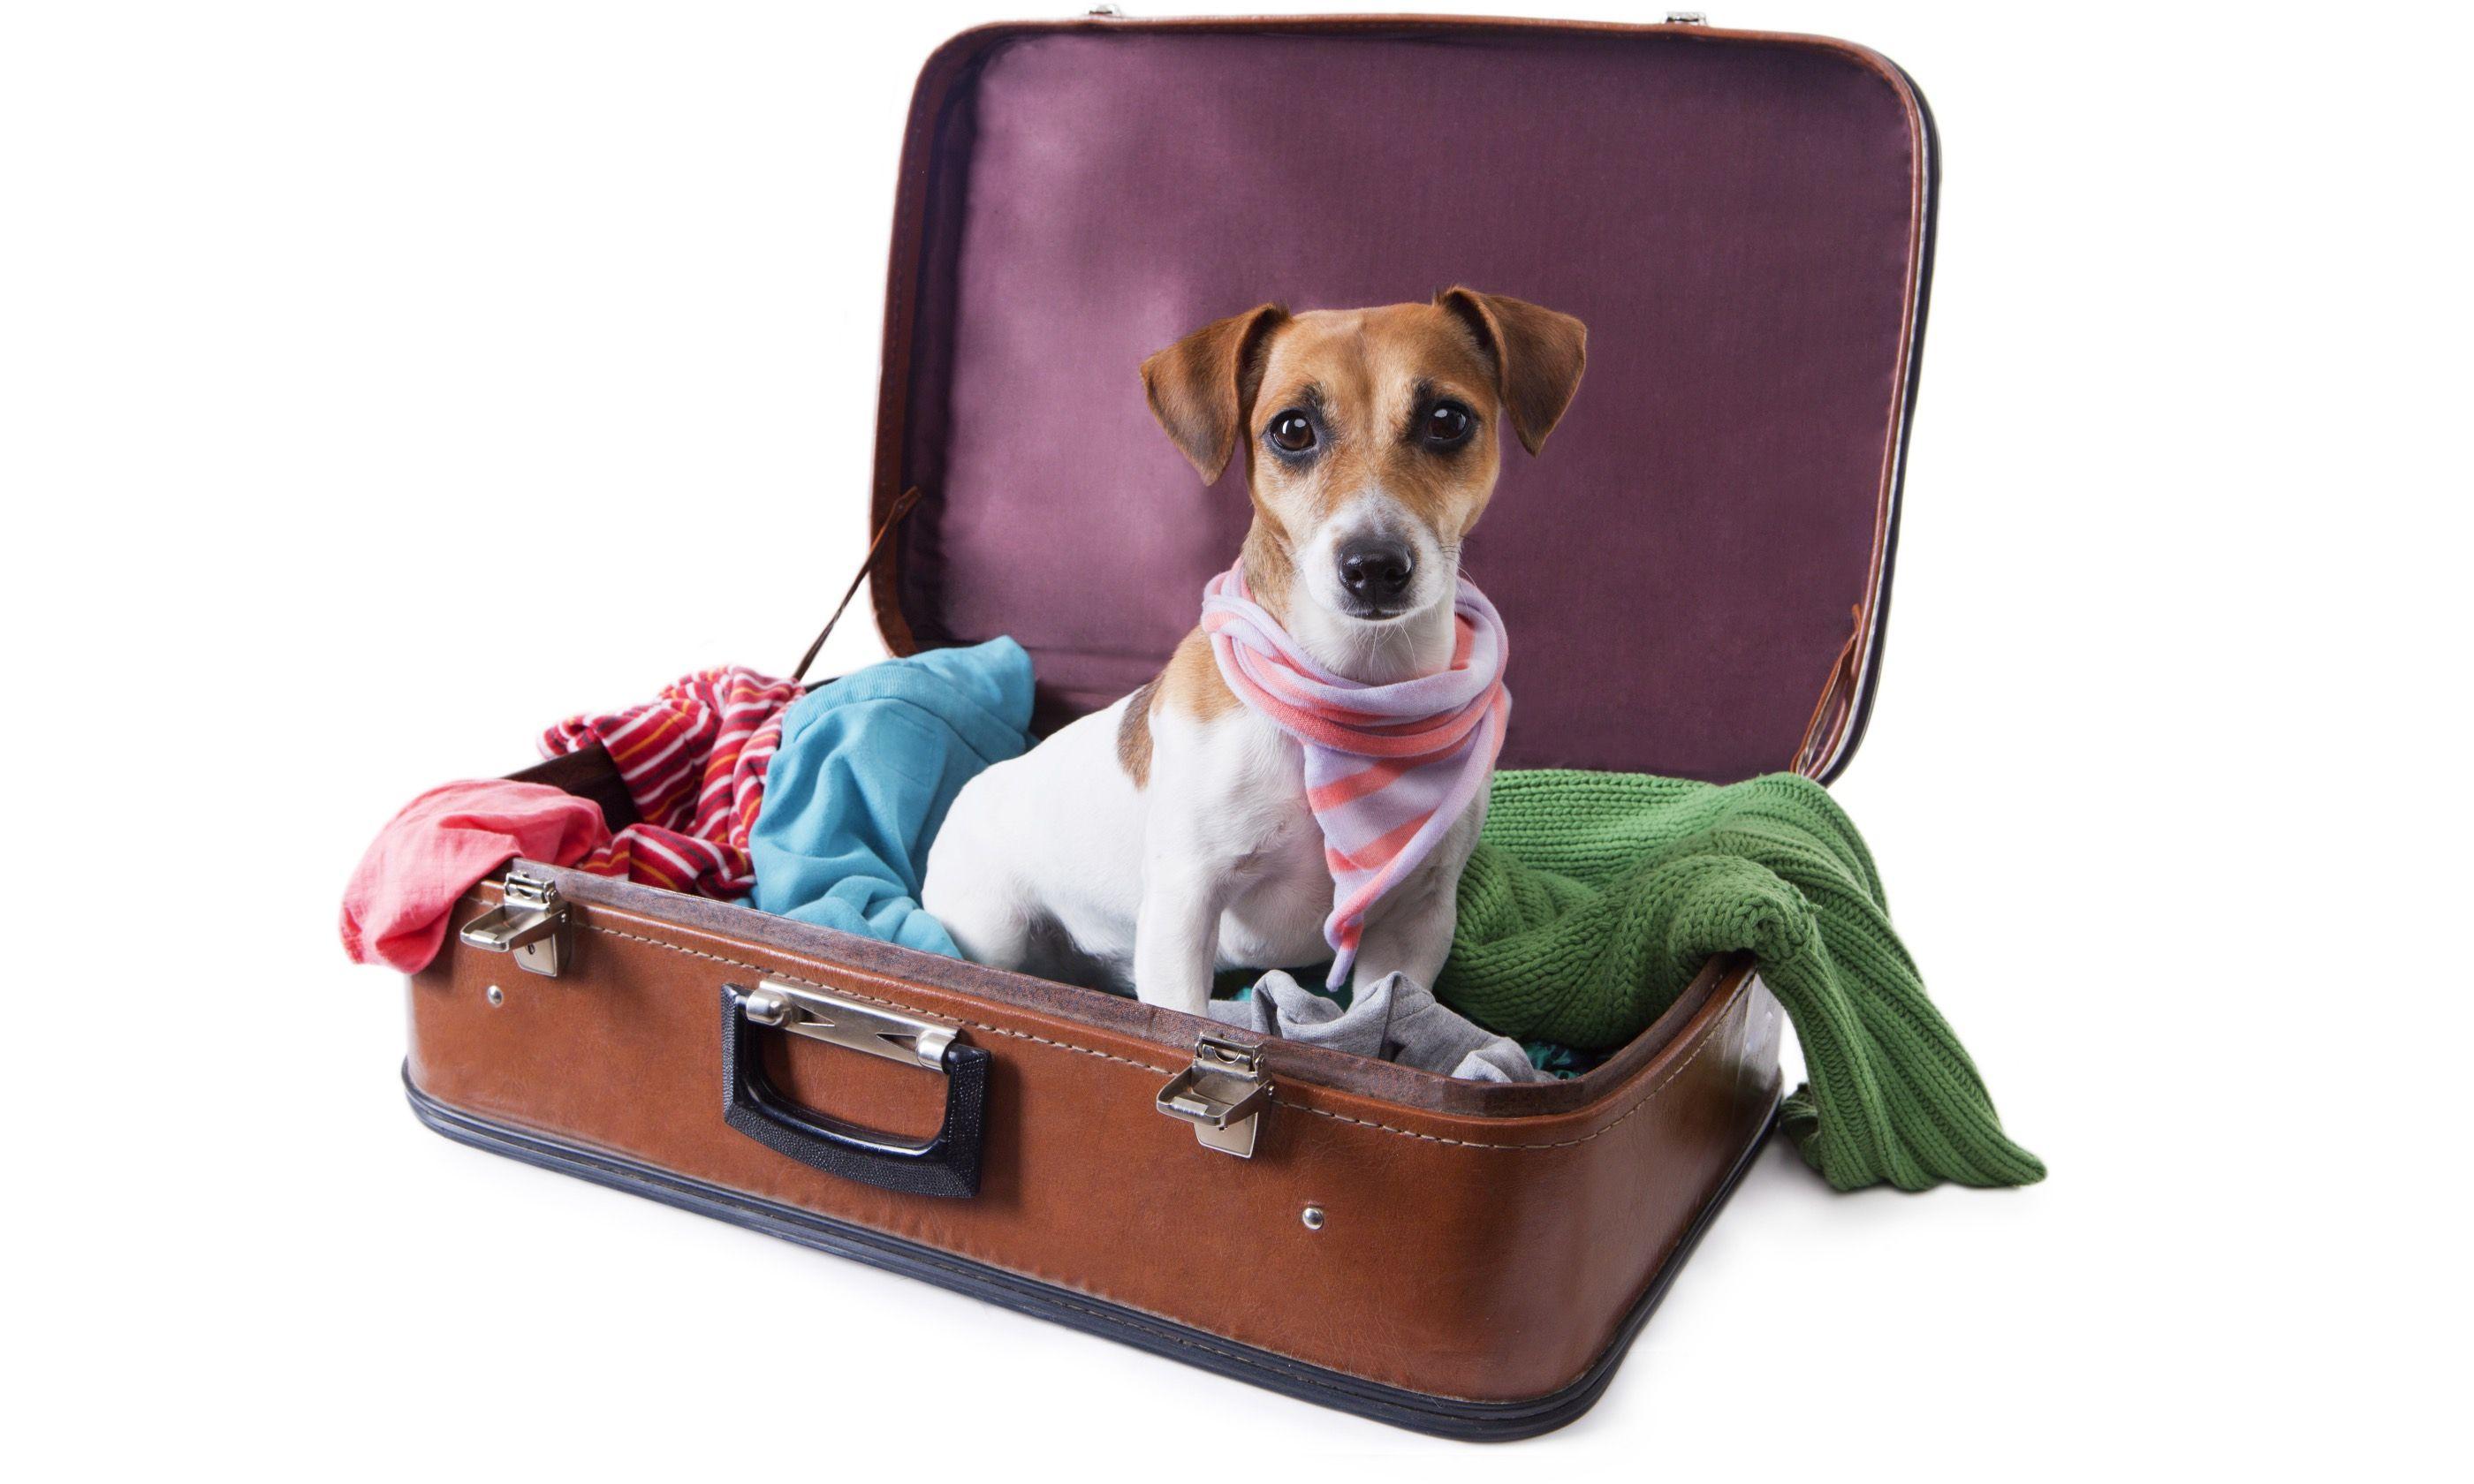 Dog in a suitcase (Shutterstock.com)